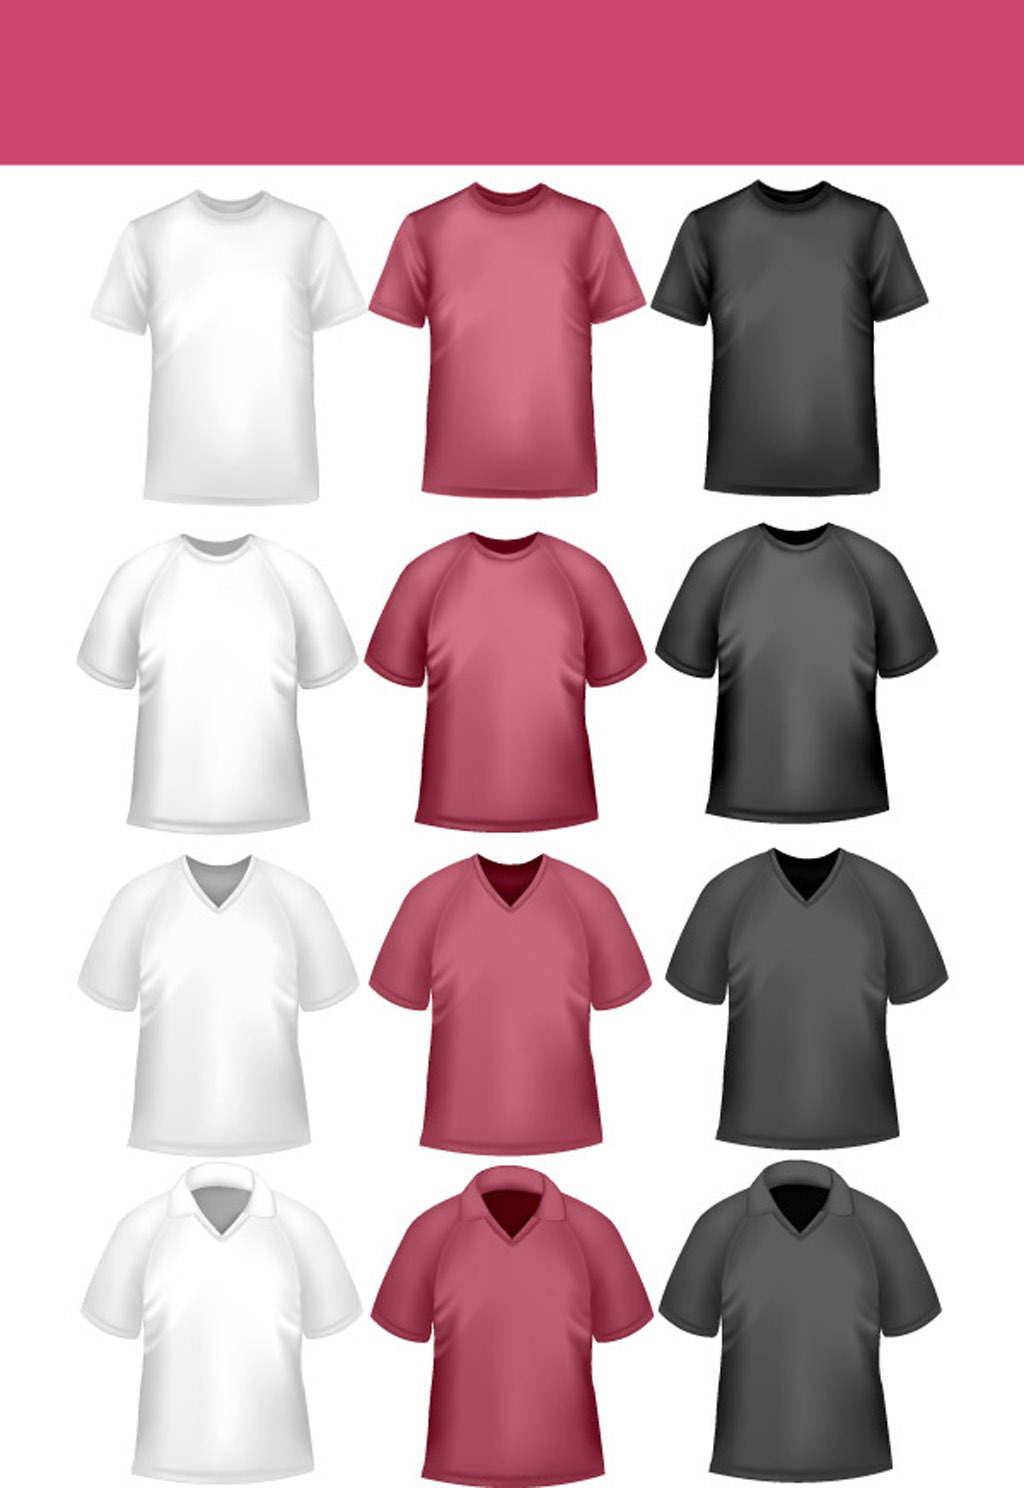 t恤设计模板下载 t恤设计图片下载